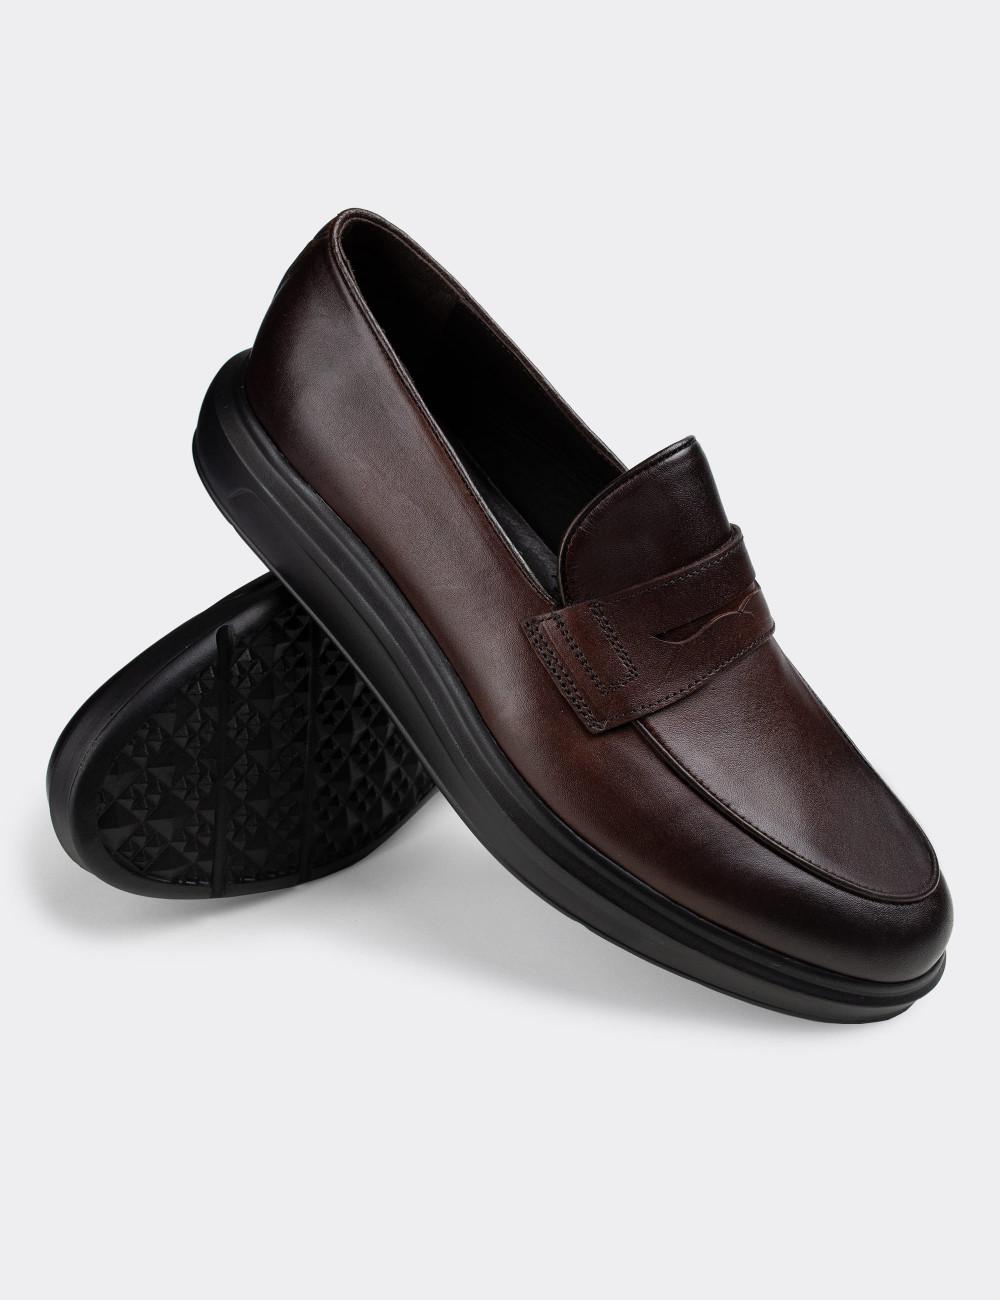 Hakiki Deri Kahverengi Loafer Erkek Ayakkabı - 01839MKHVP01